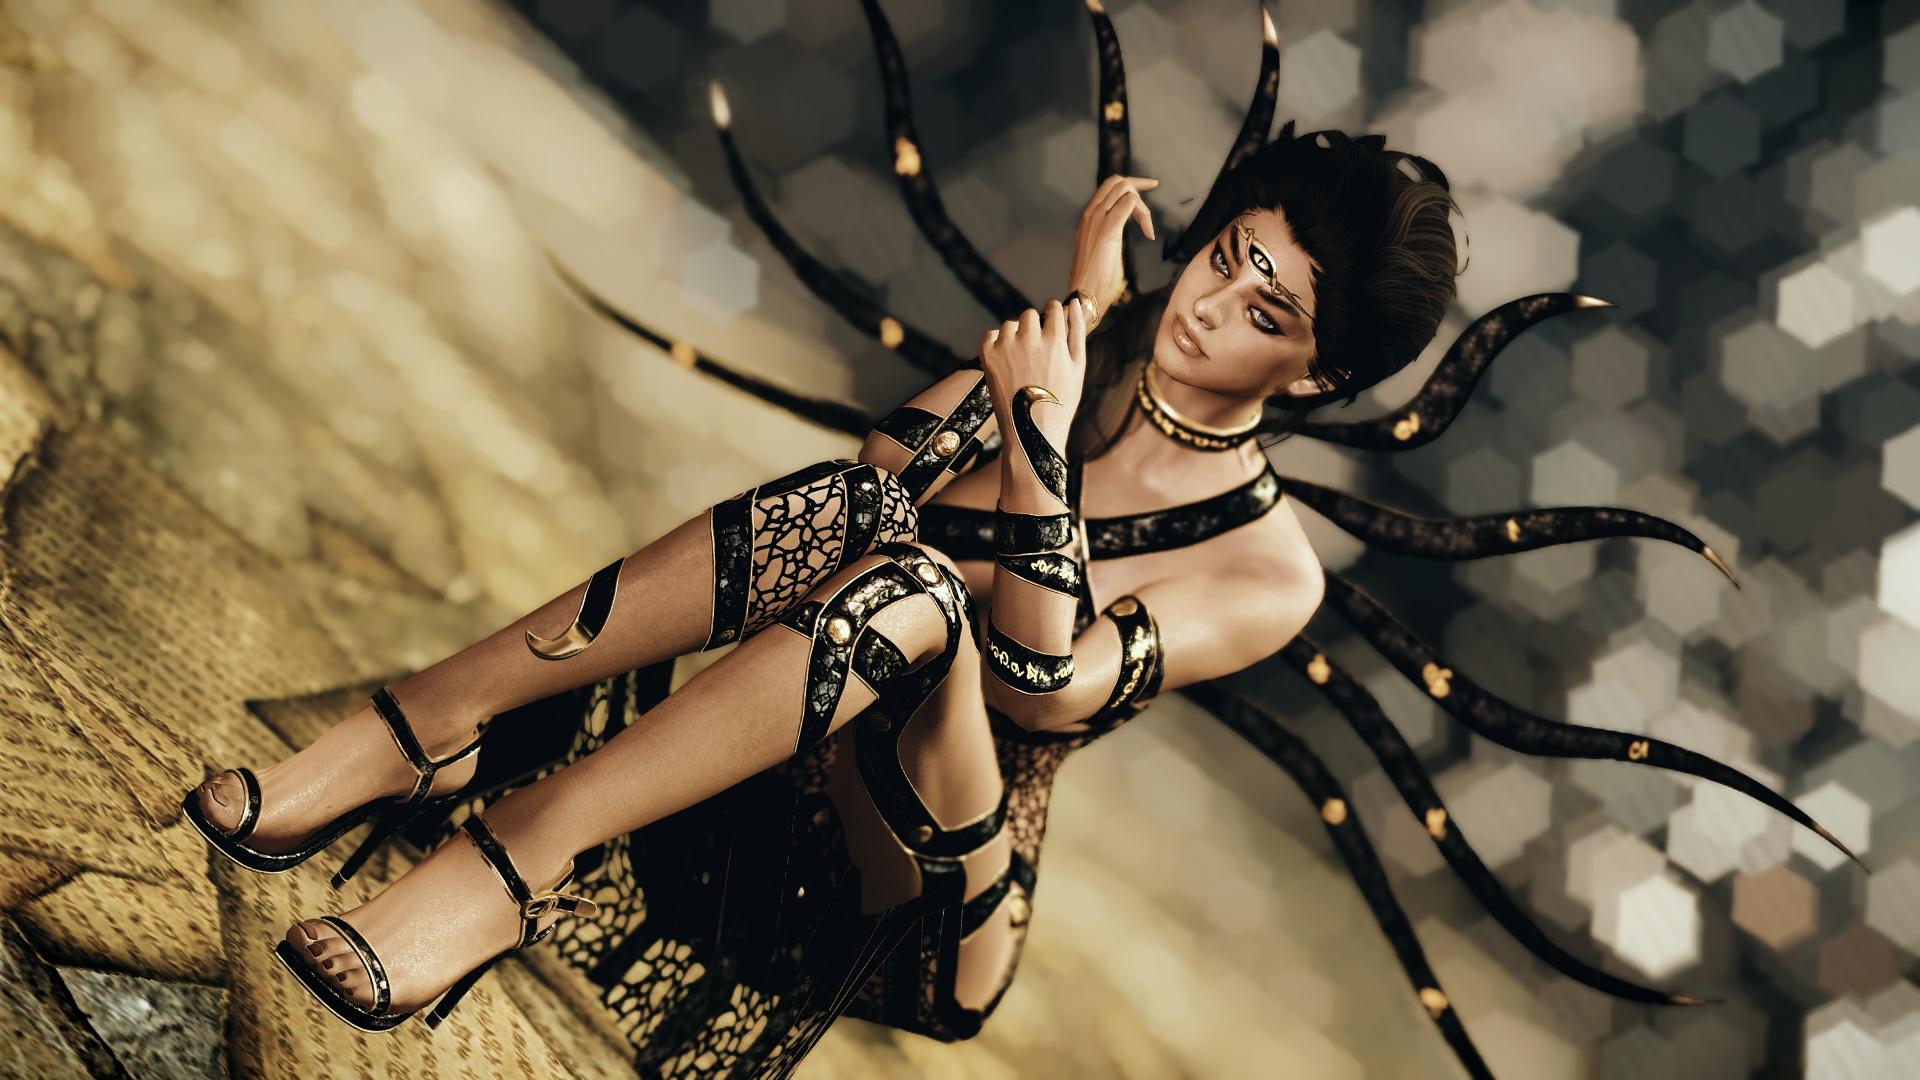 Скачать Кассандра - одеяние Апокрифа от DeserterX (SE) / DX Cassandra Apocrypha Robes